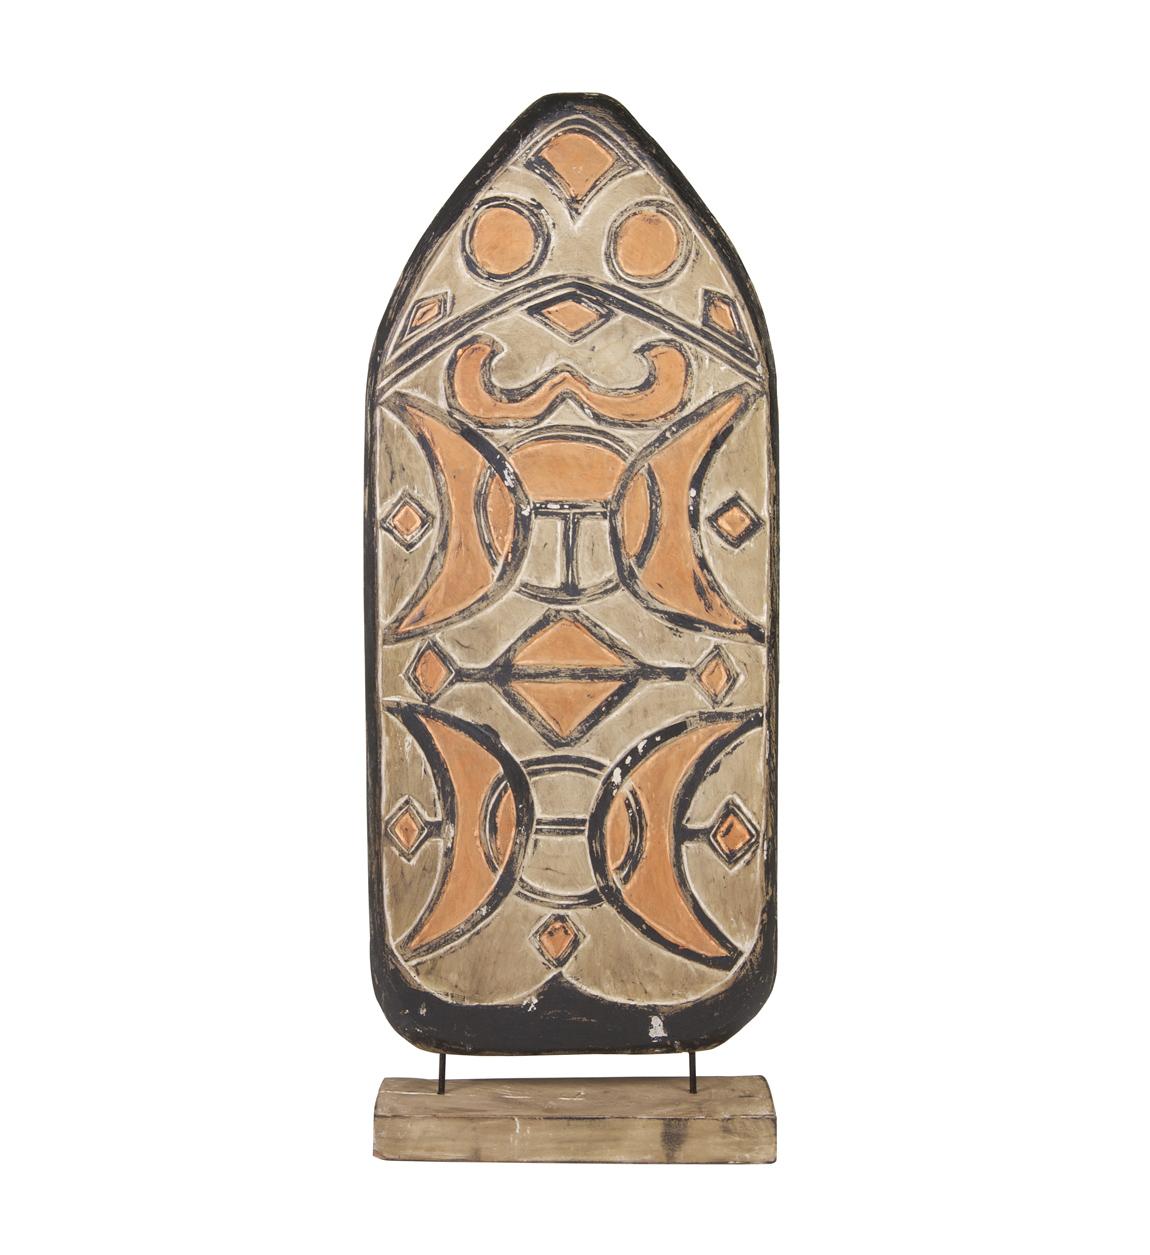 Figure de bouclier en bois marron